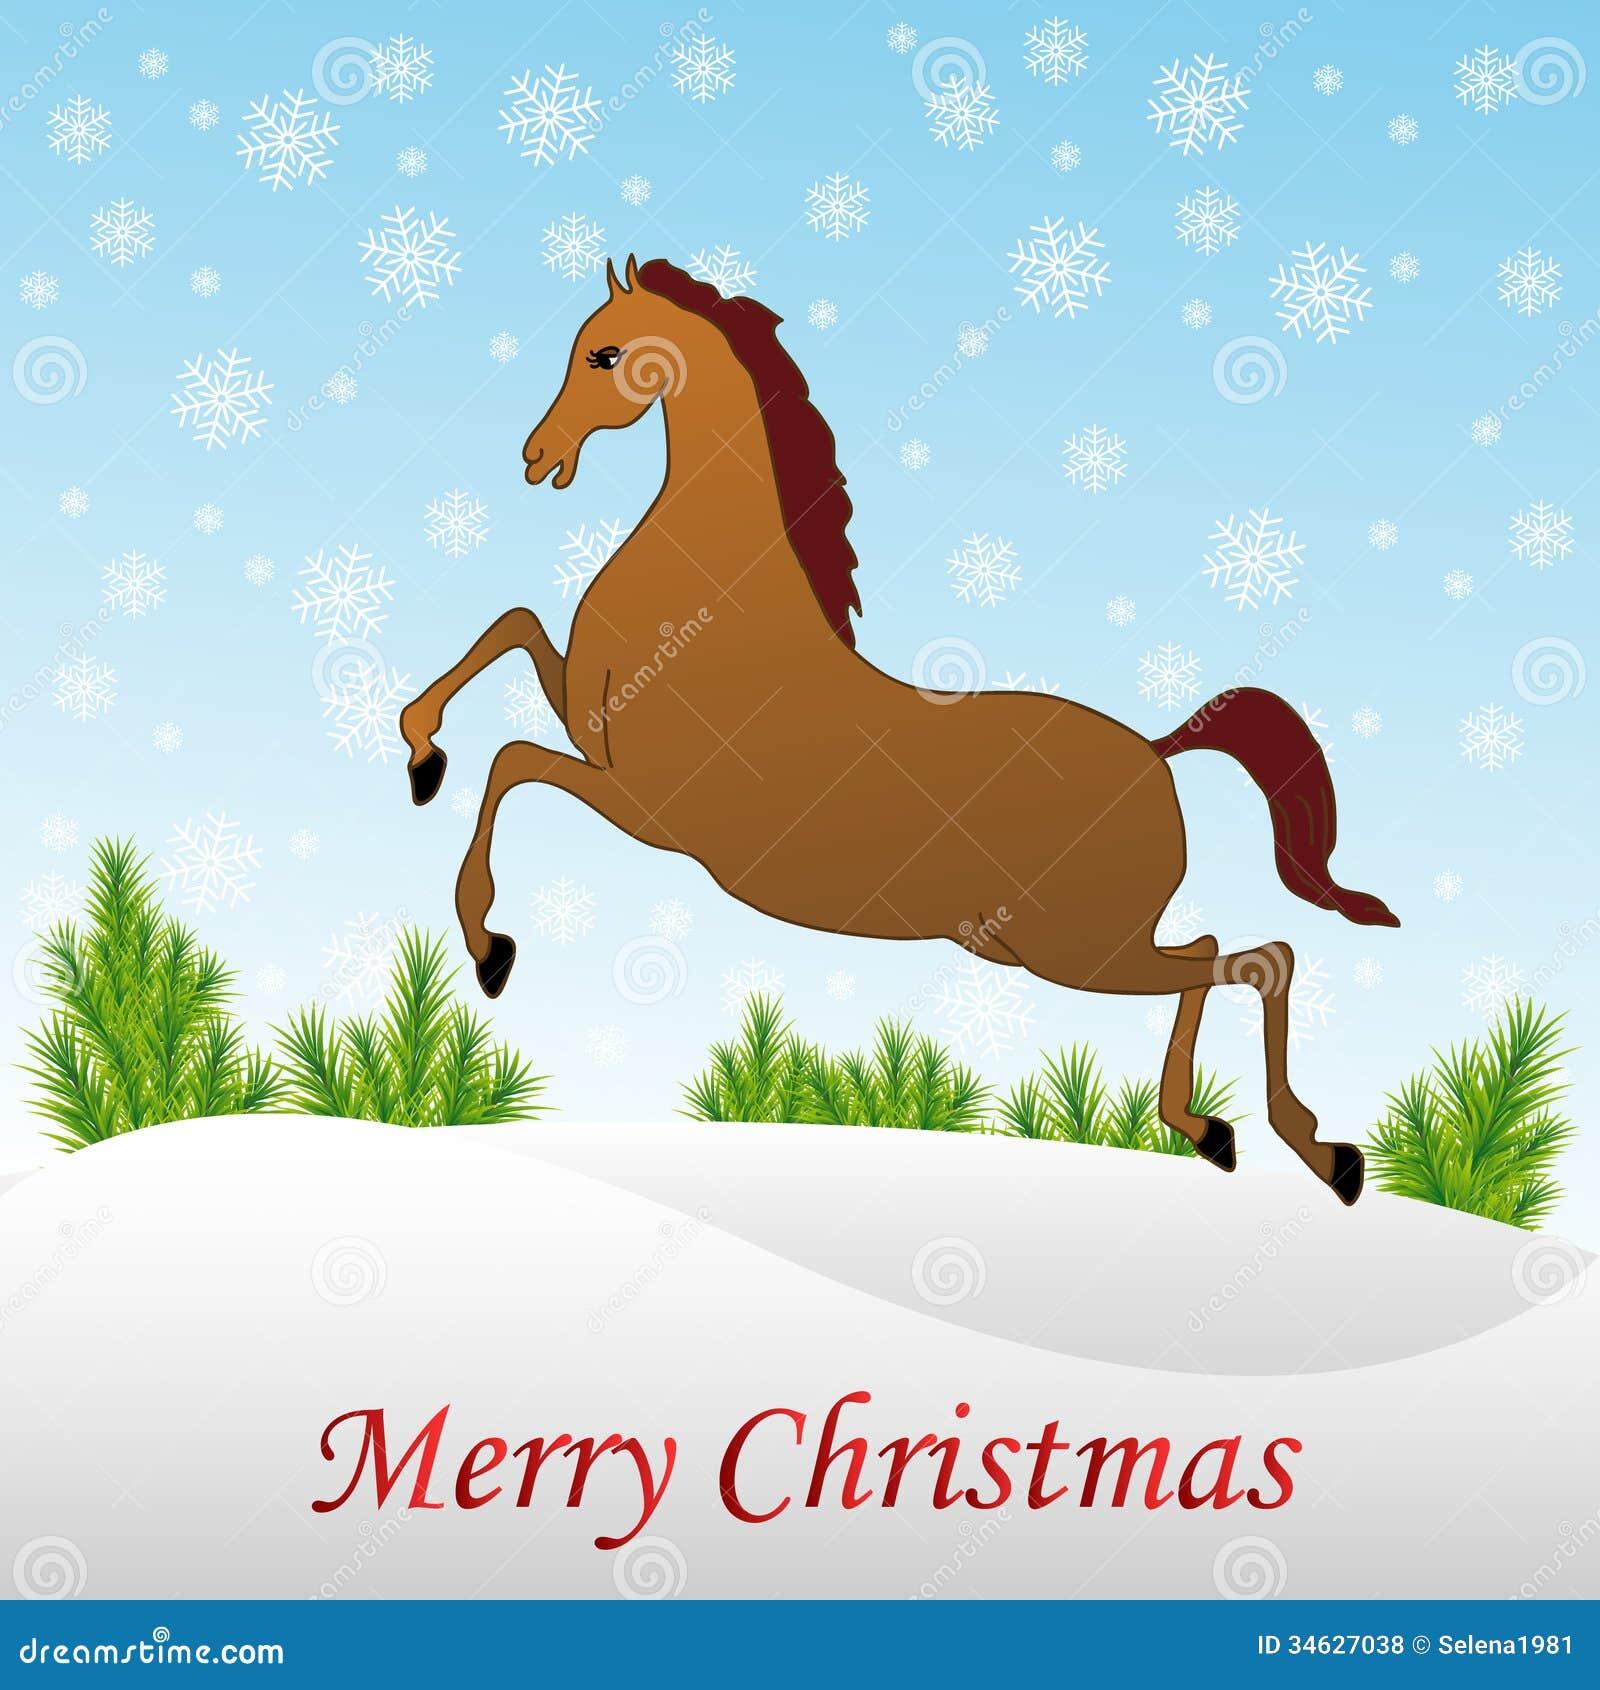 Christmas Horse In Snow Stock Vector Illustration Of Invitation 34627038